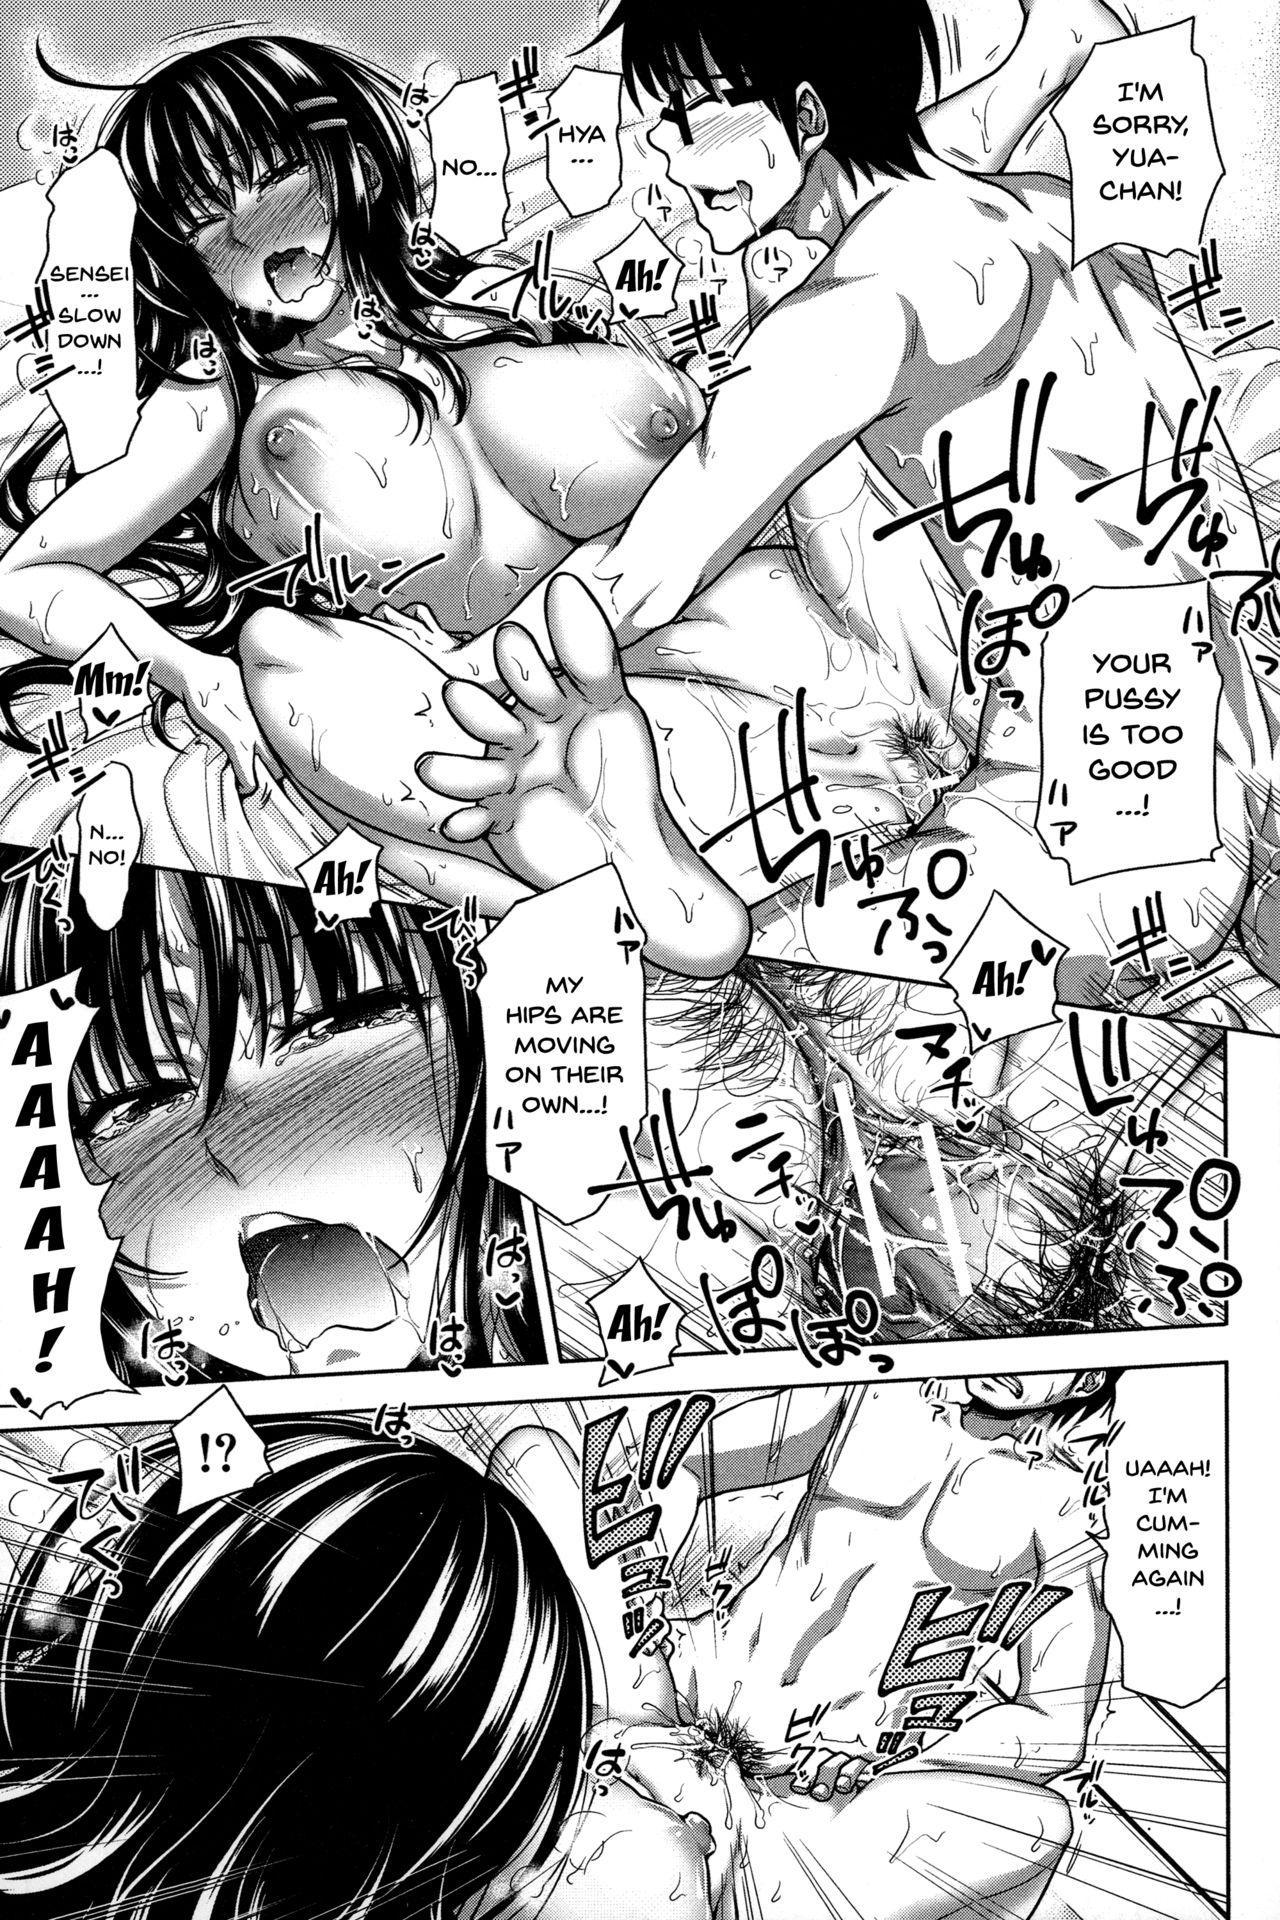 Pakotate! Seikouritsu 0% no Teppeki Bishojo VS Seikouritsu 100% no Hentai Katei Kyoushi   Pakotate! Sex Rate 0% Iron-Willed Beautiful Virgins VS Sex Rate 100% Perverted Coach 156